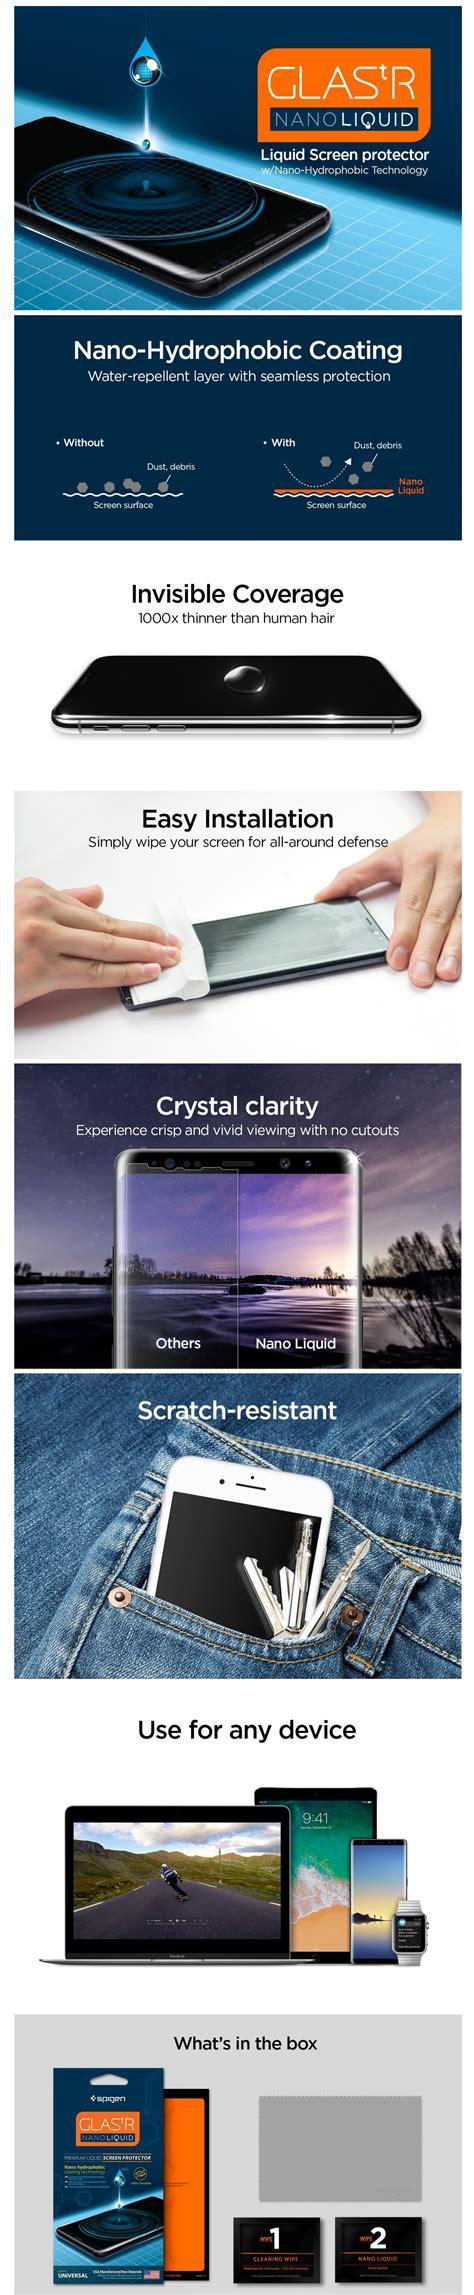 Original Spigen Screen Protector Glas Tr Nano Liquid Universal Sp universal screen protector quot glas tr nano liquid quot spigen